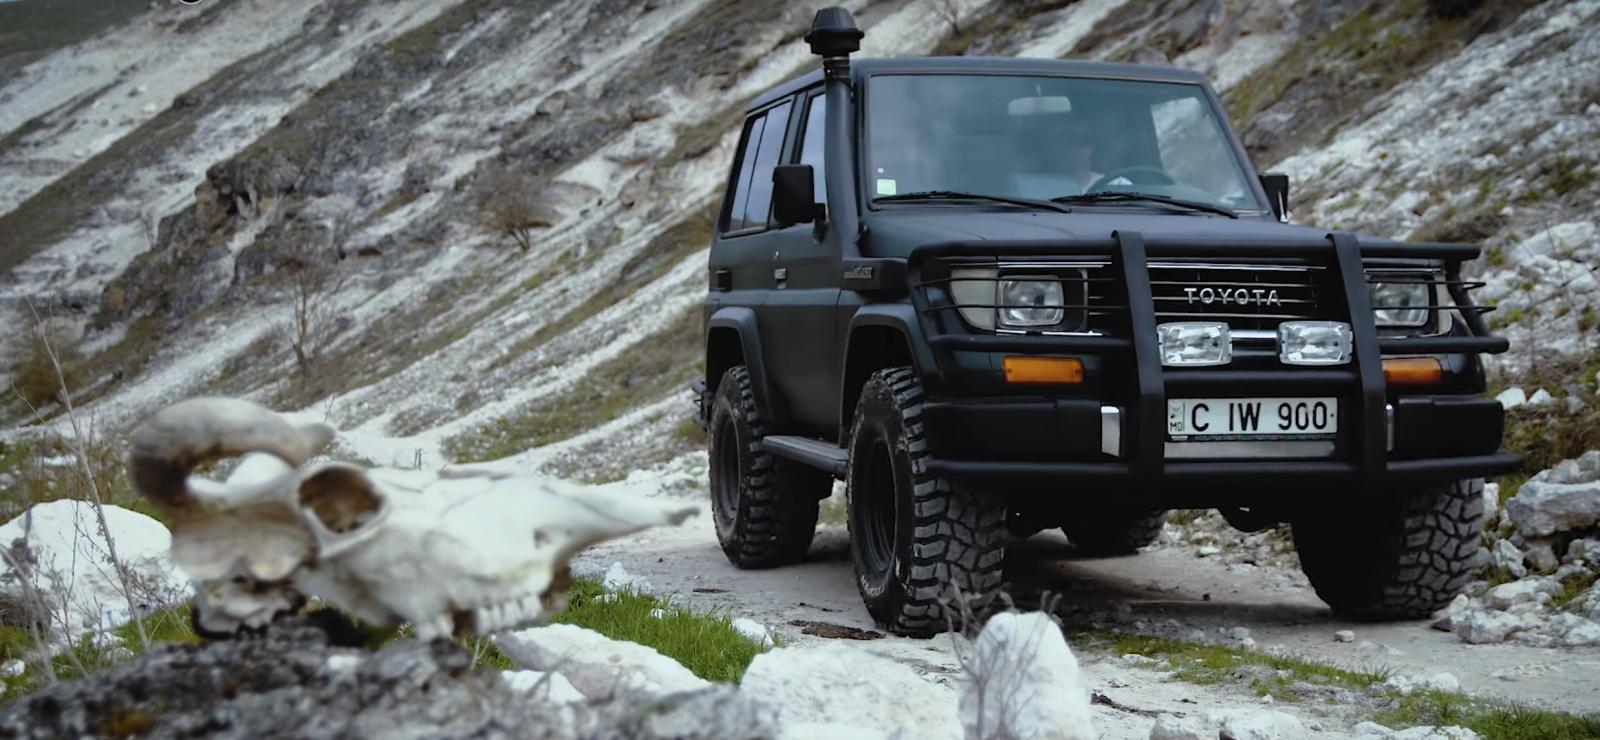 (video) Test Drive: Toyota Land Cruiser 70